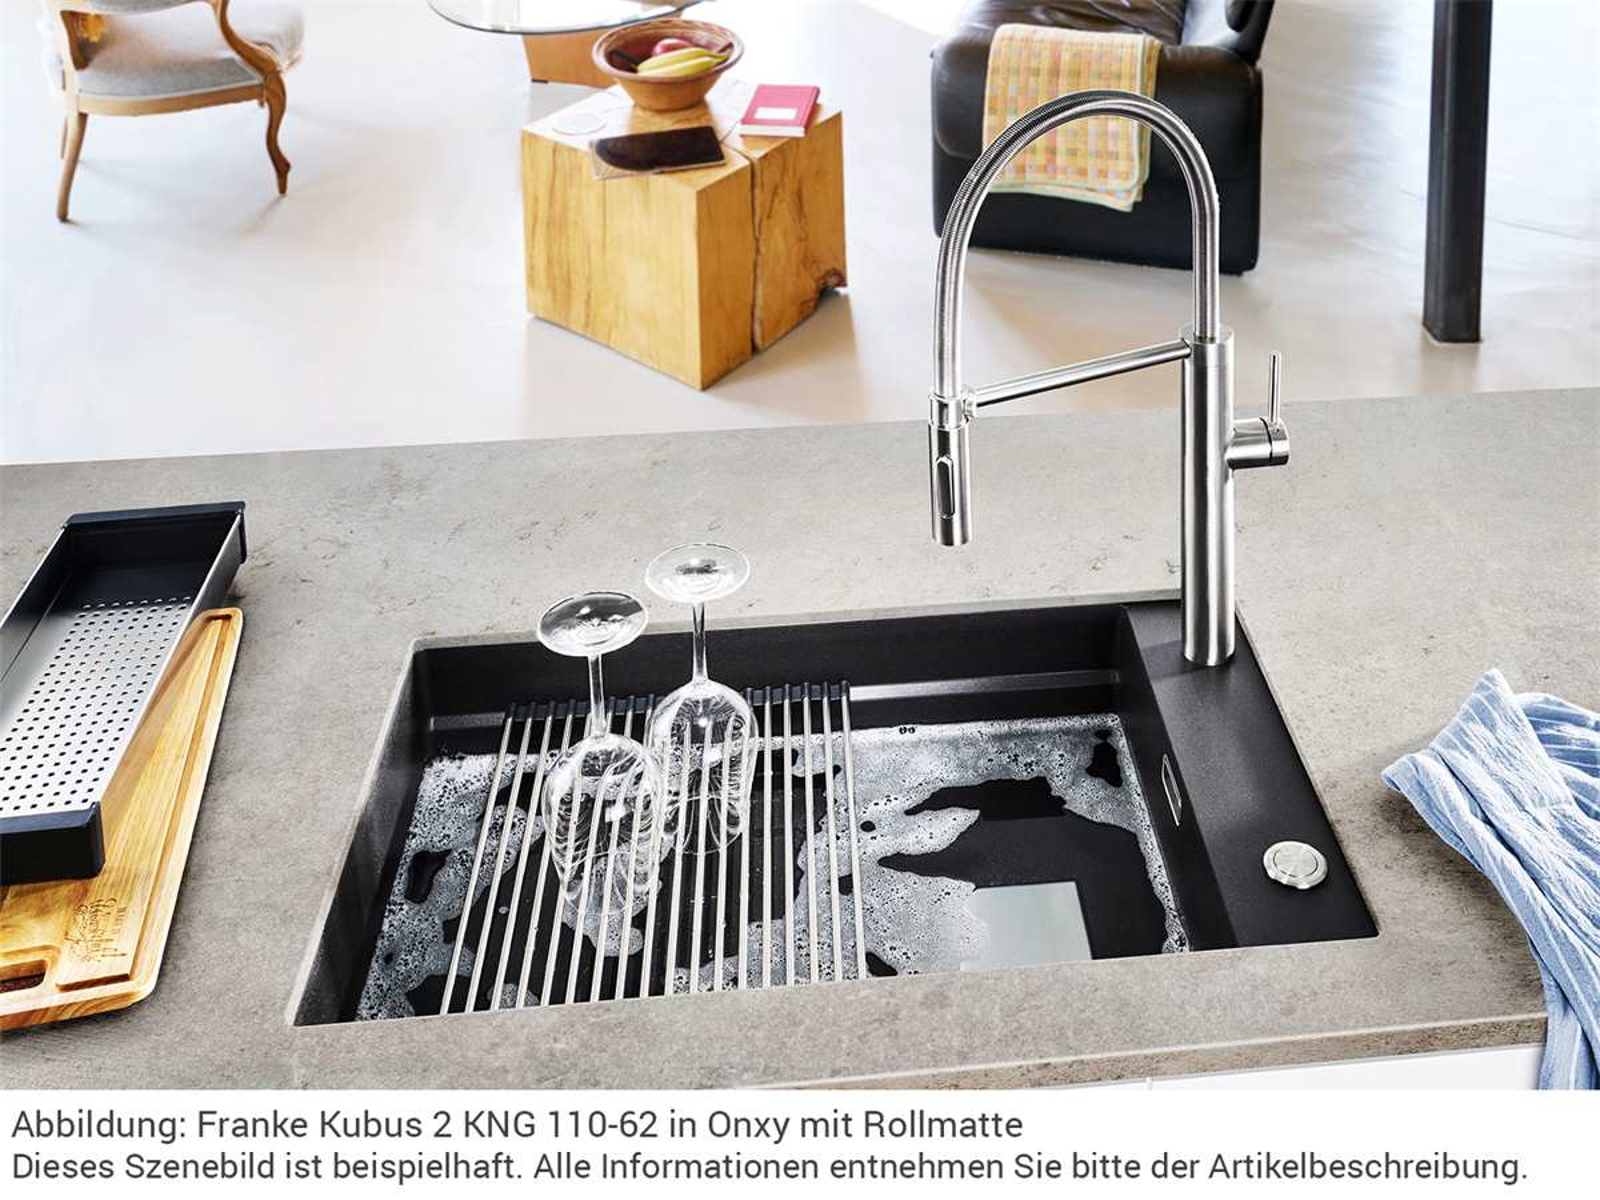 Franke Kubus 2 KNG 110-62 Onyx - 11644 Granitspüle Exzenterbetätigung